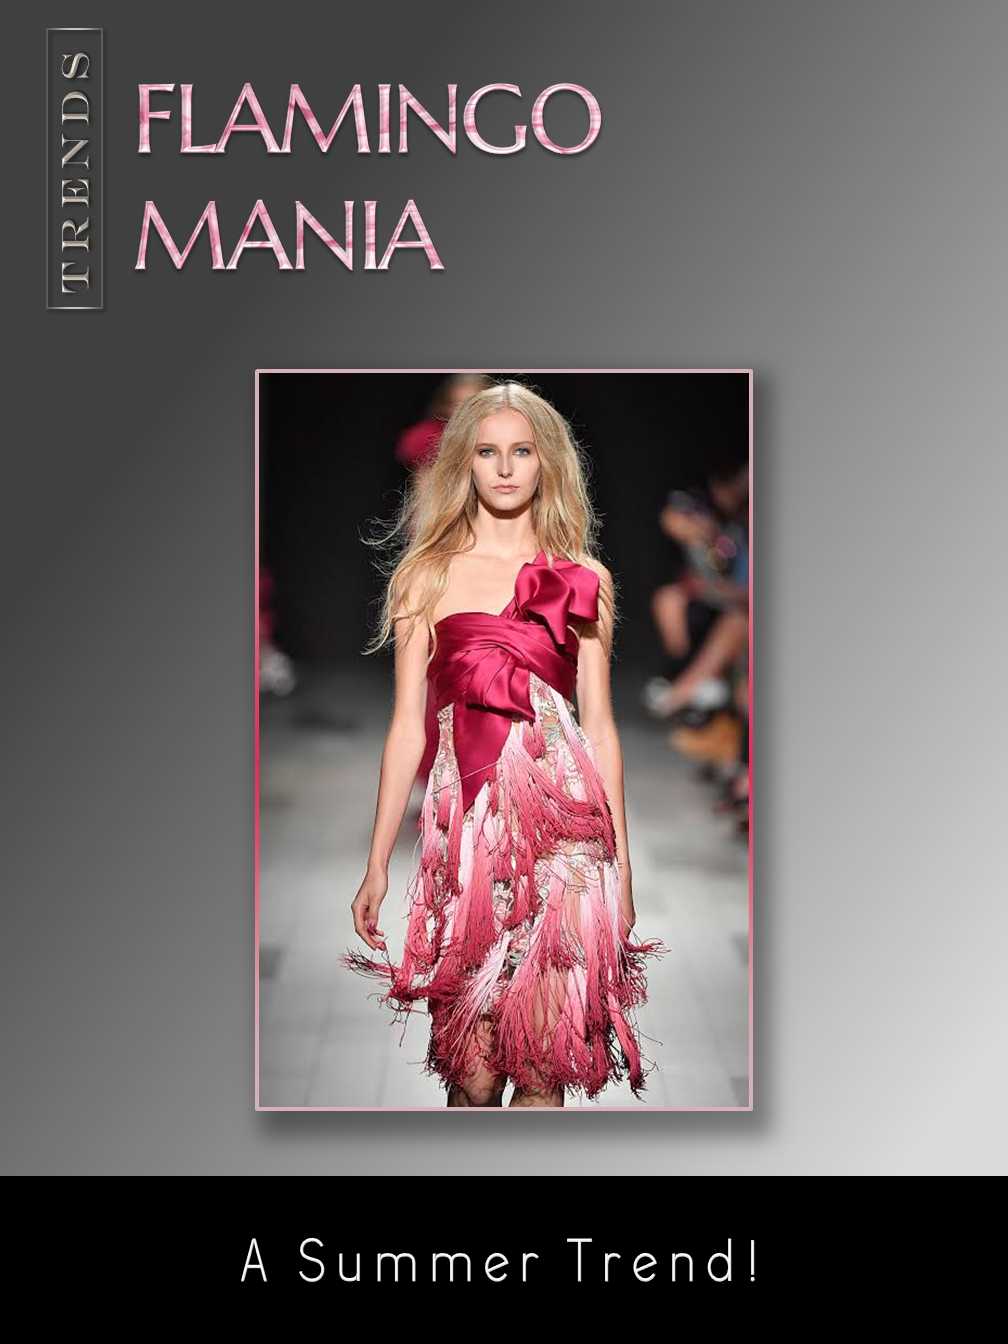 Flamingo-mania